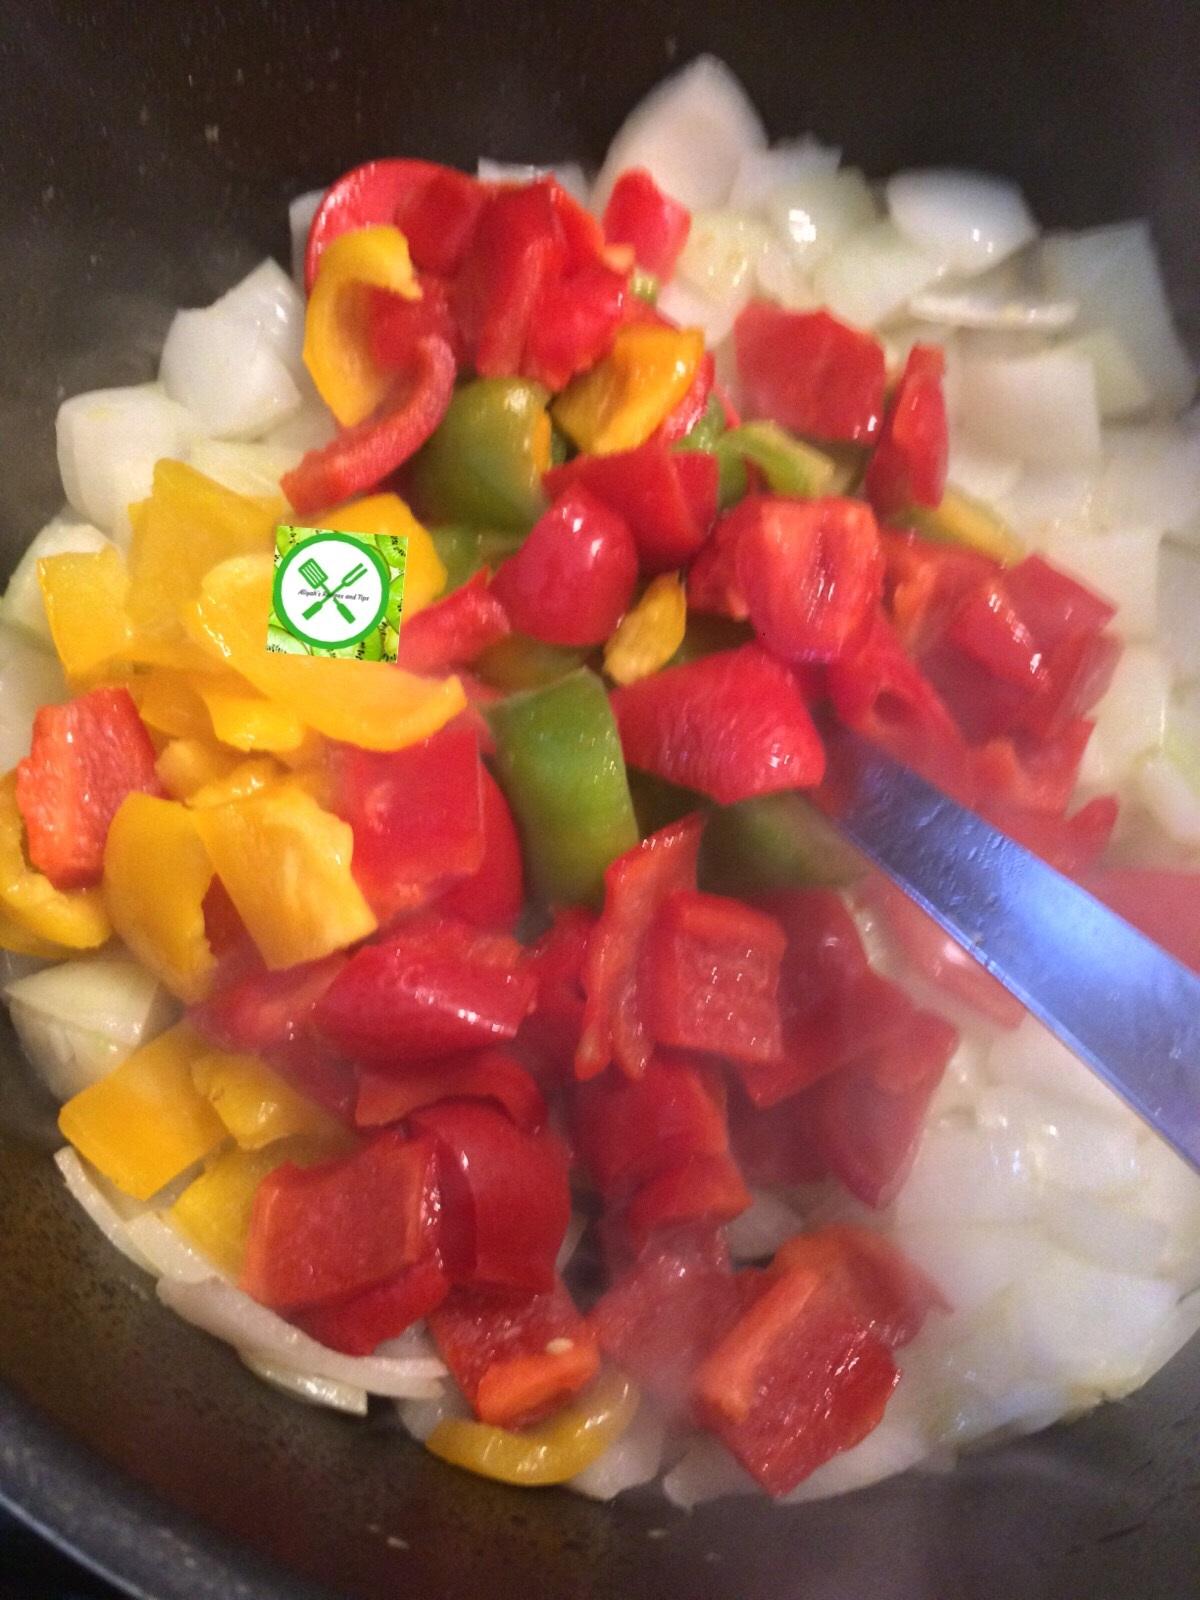 Goat n mushrooms add peppers